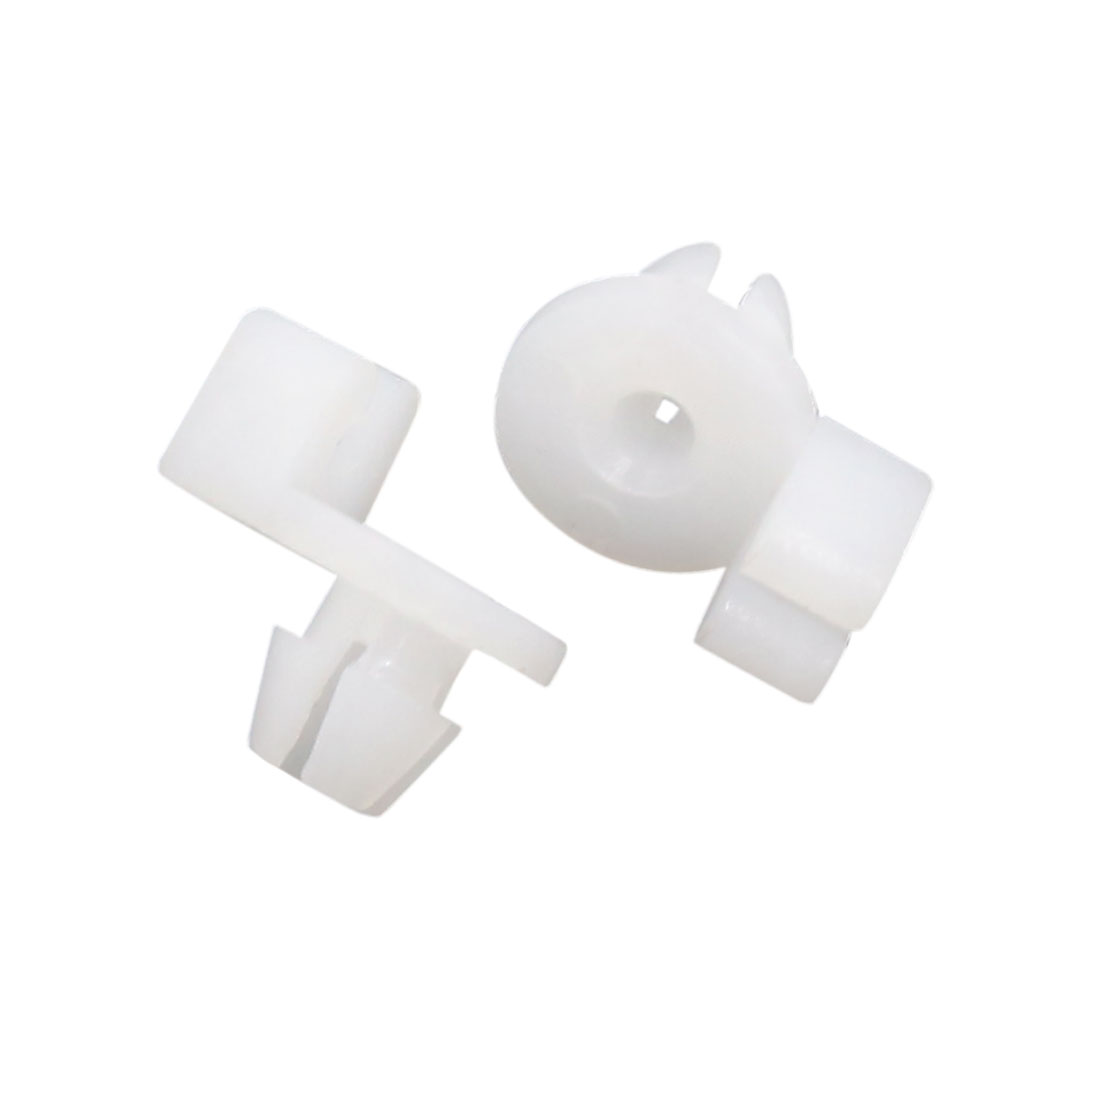 20Pcs White Plastic Rivets Interior Panel Trim Clips Retainer 7.5mm for Auto Car